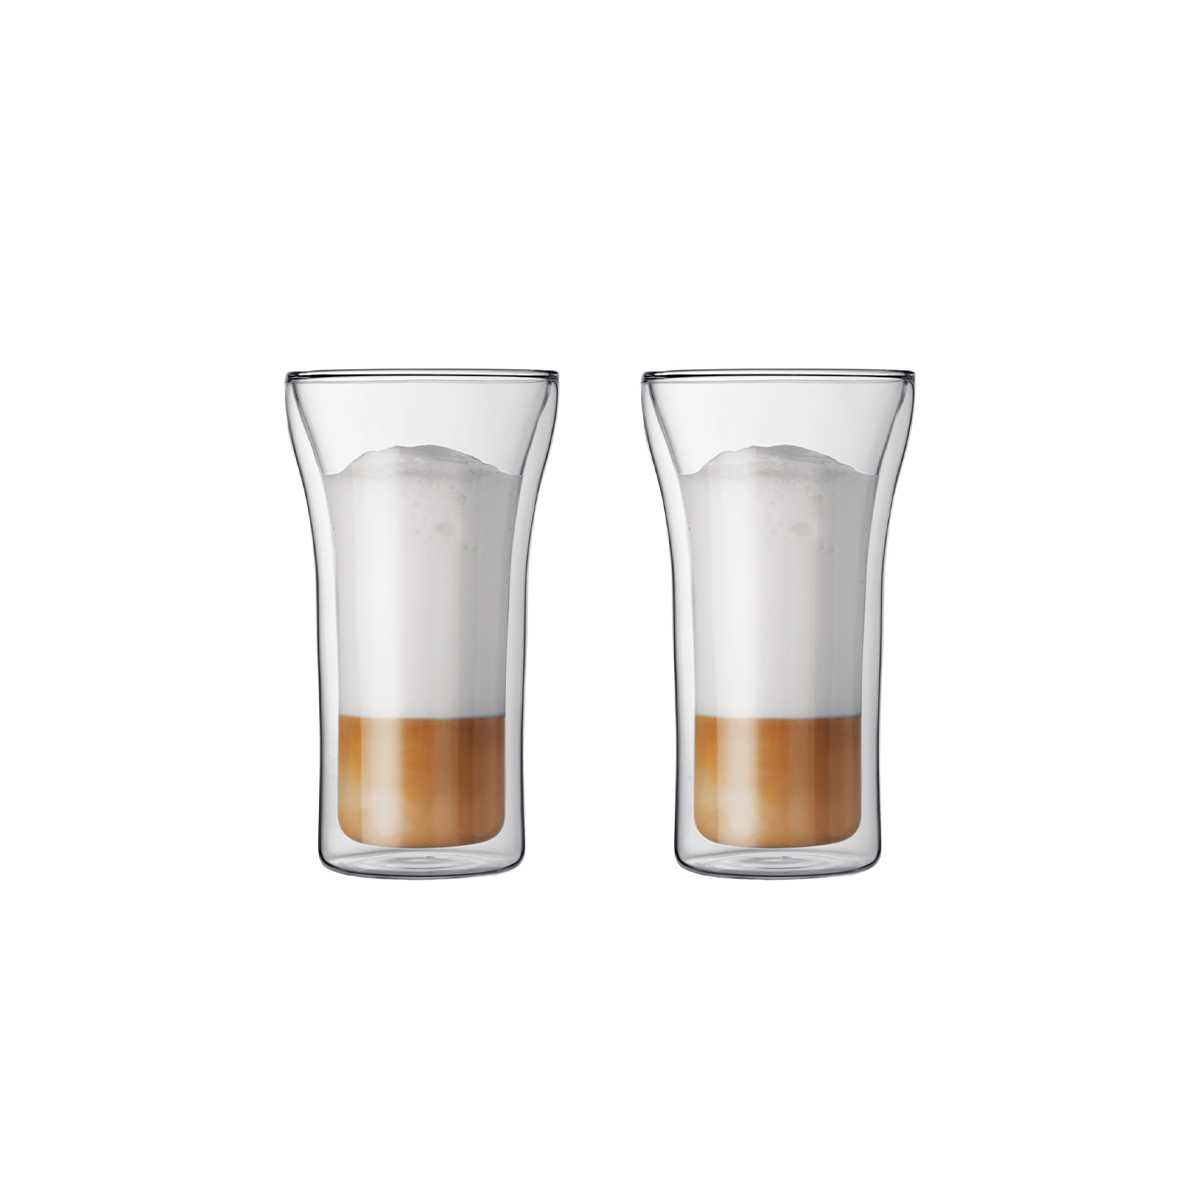 Набор термо-стаканов 0,4 л, 2 шт Bodum Assam  (4547-10) Bodum 4547-10 фото 1